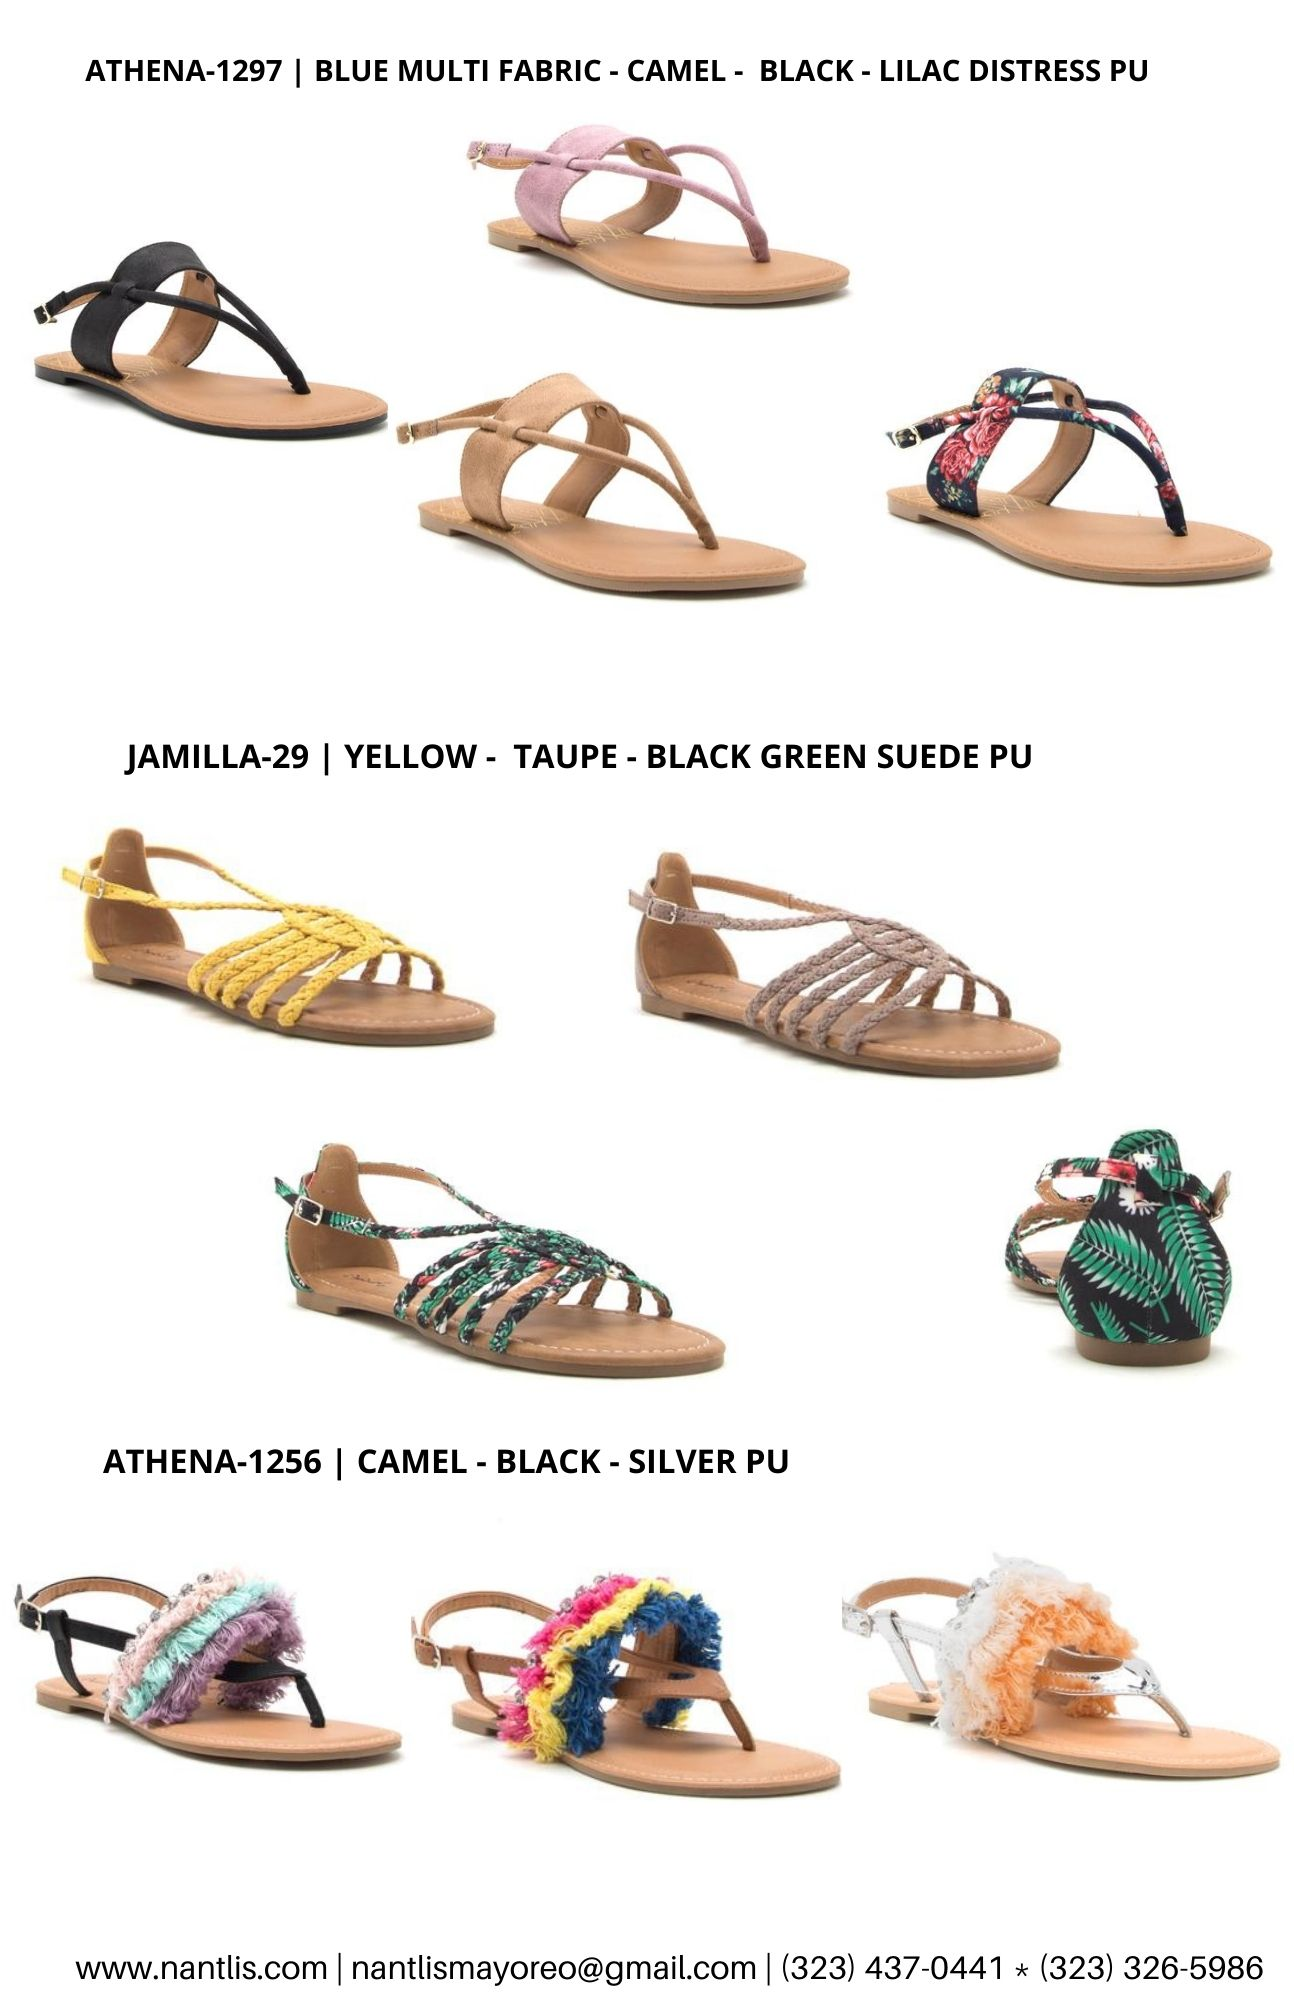 Catalogo Vol QU44 Sandalias de mujer mayoreo Wholesale Sandals page 06